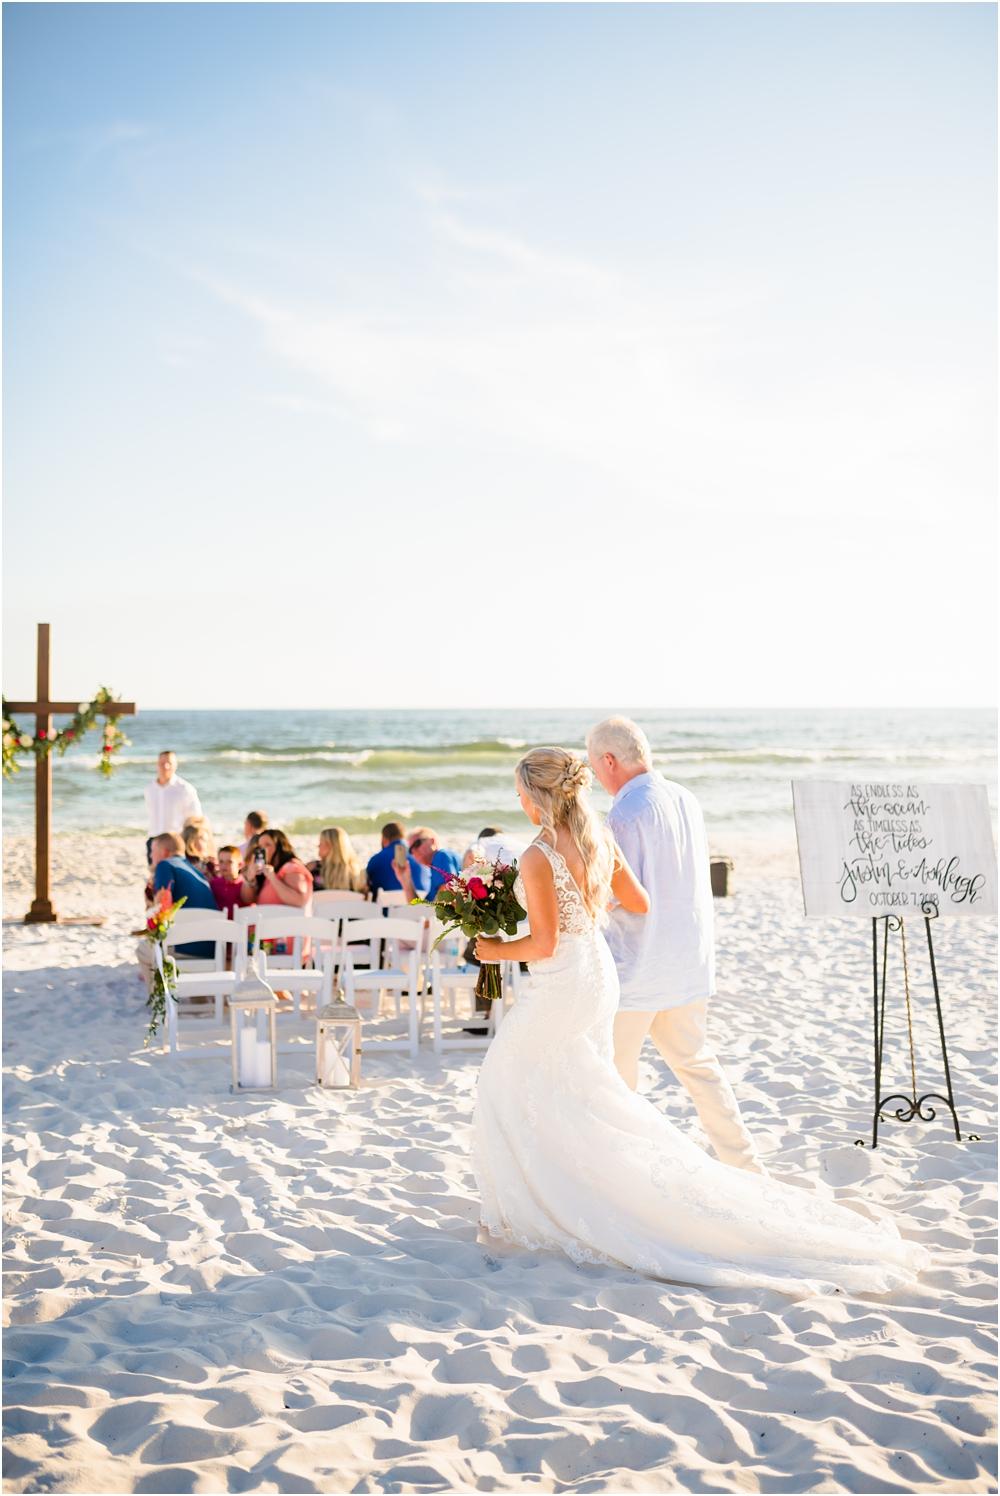 mcglothlin-wedding-kiersten-stevenson-photography-30a-panama-city-beach-dothan-tallahassee-(79-of-145).jpg